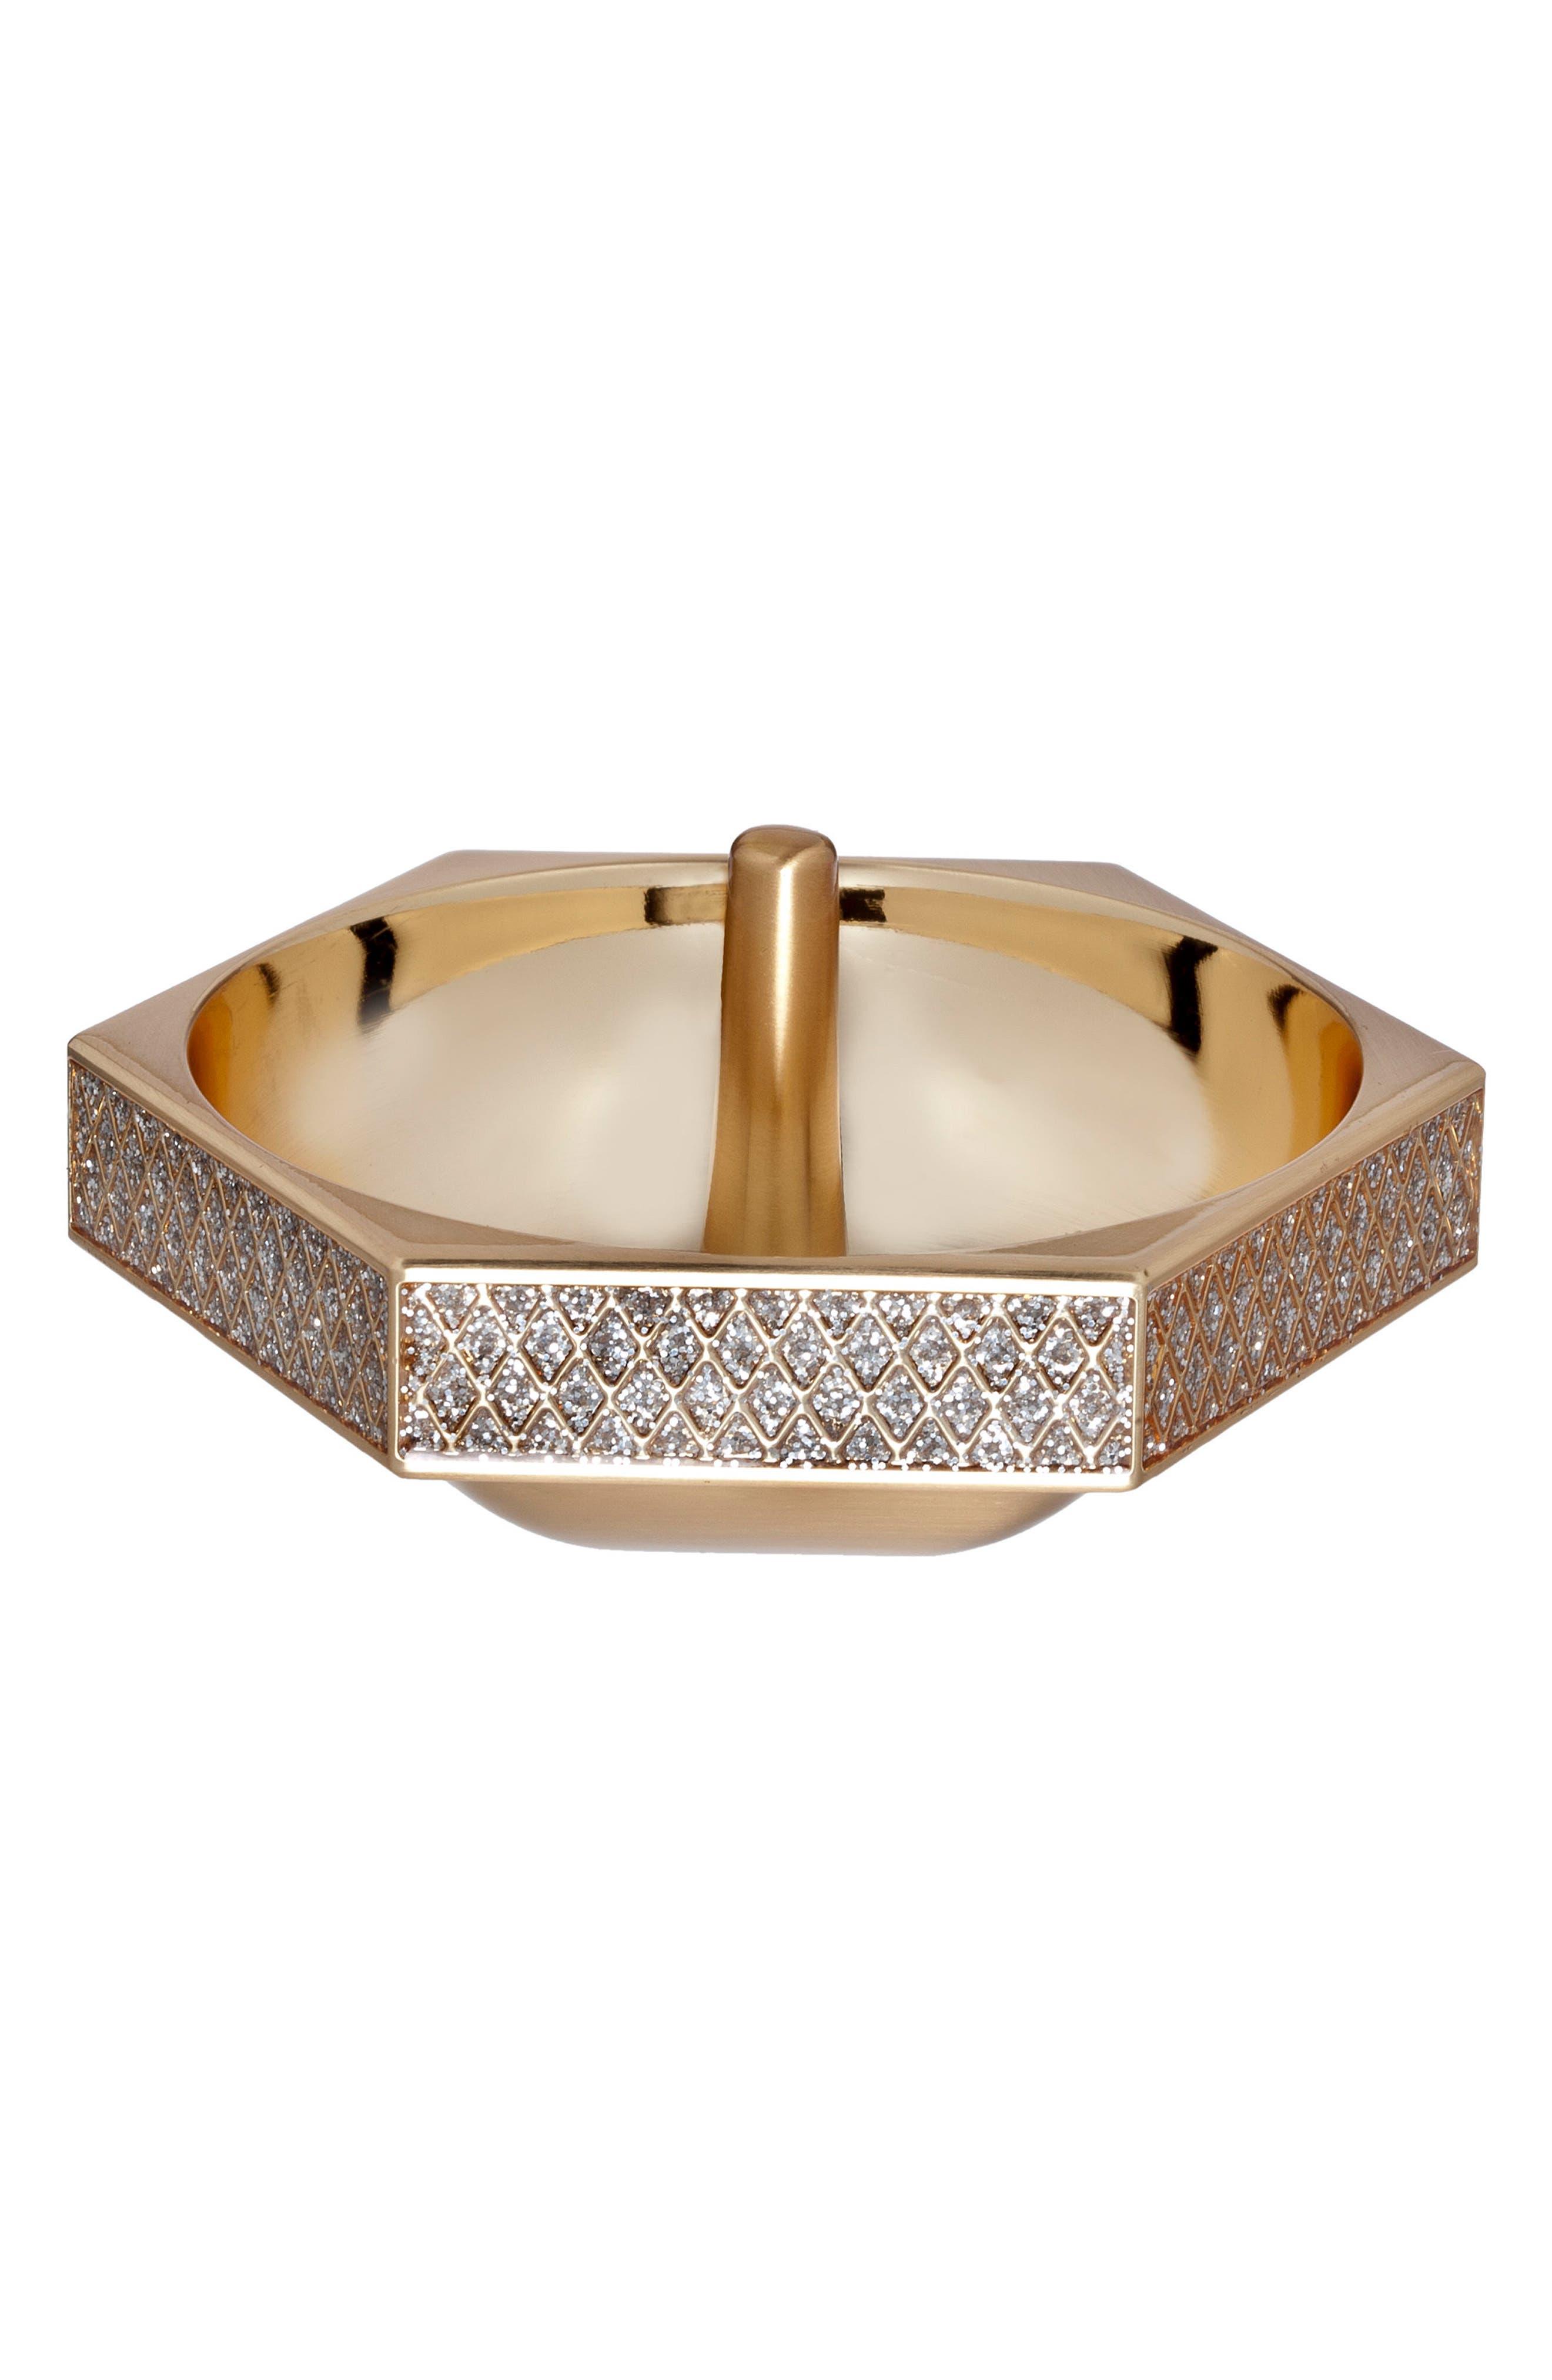 Alternate Image 1 Selected - Waterford Lismore Diamond Gold Ring Holder